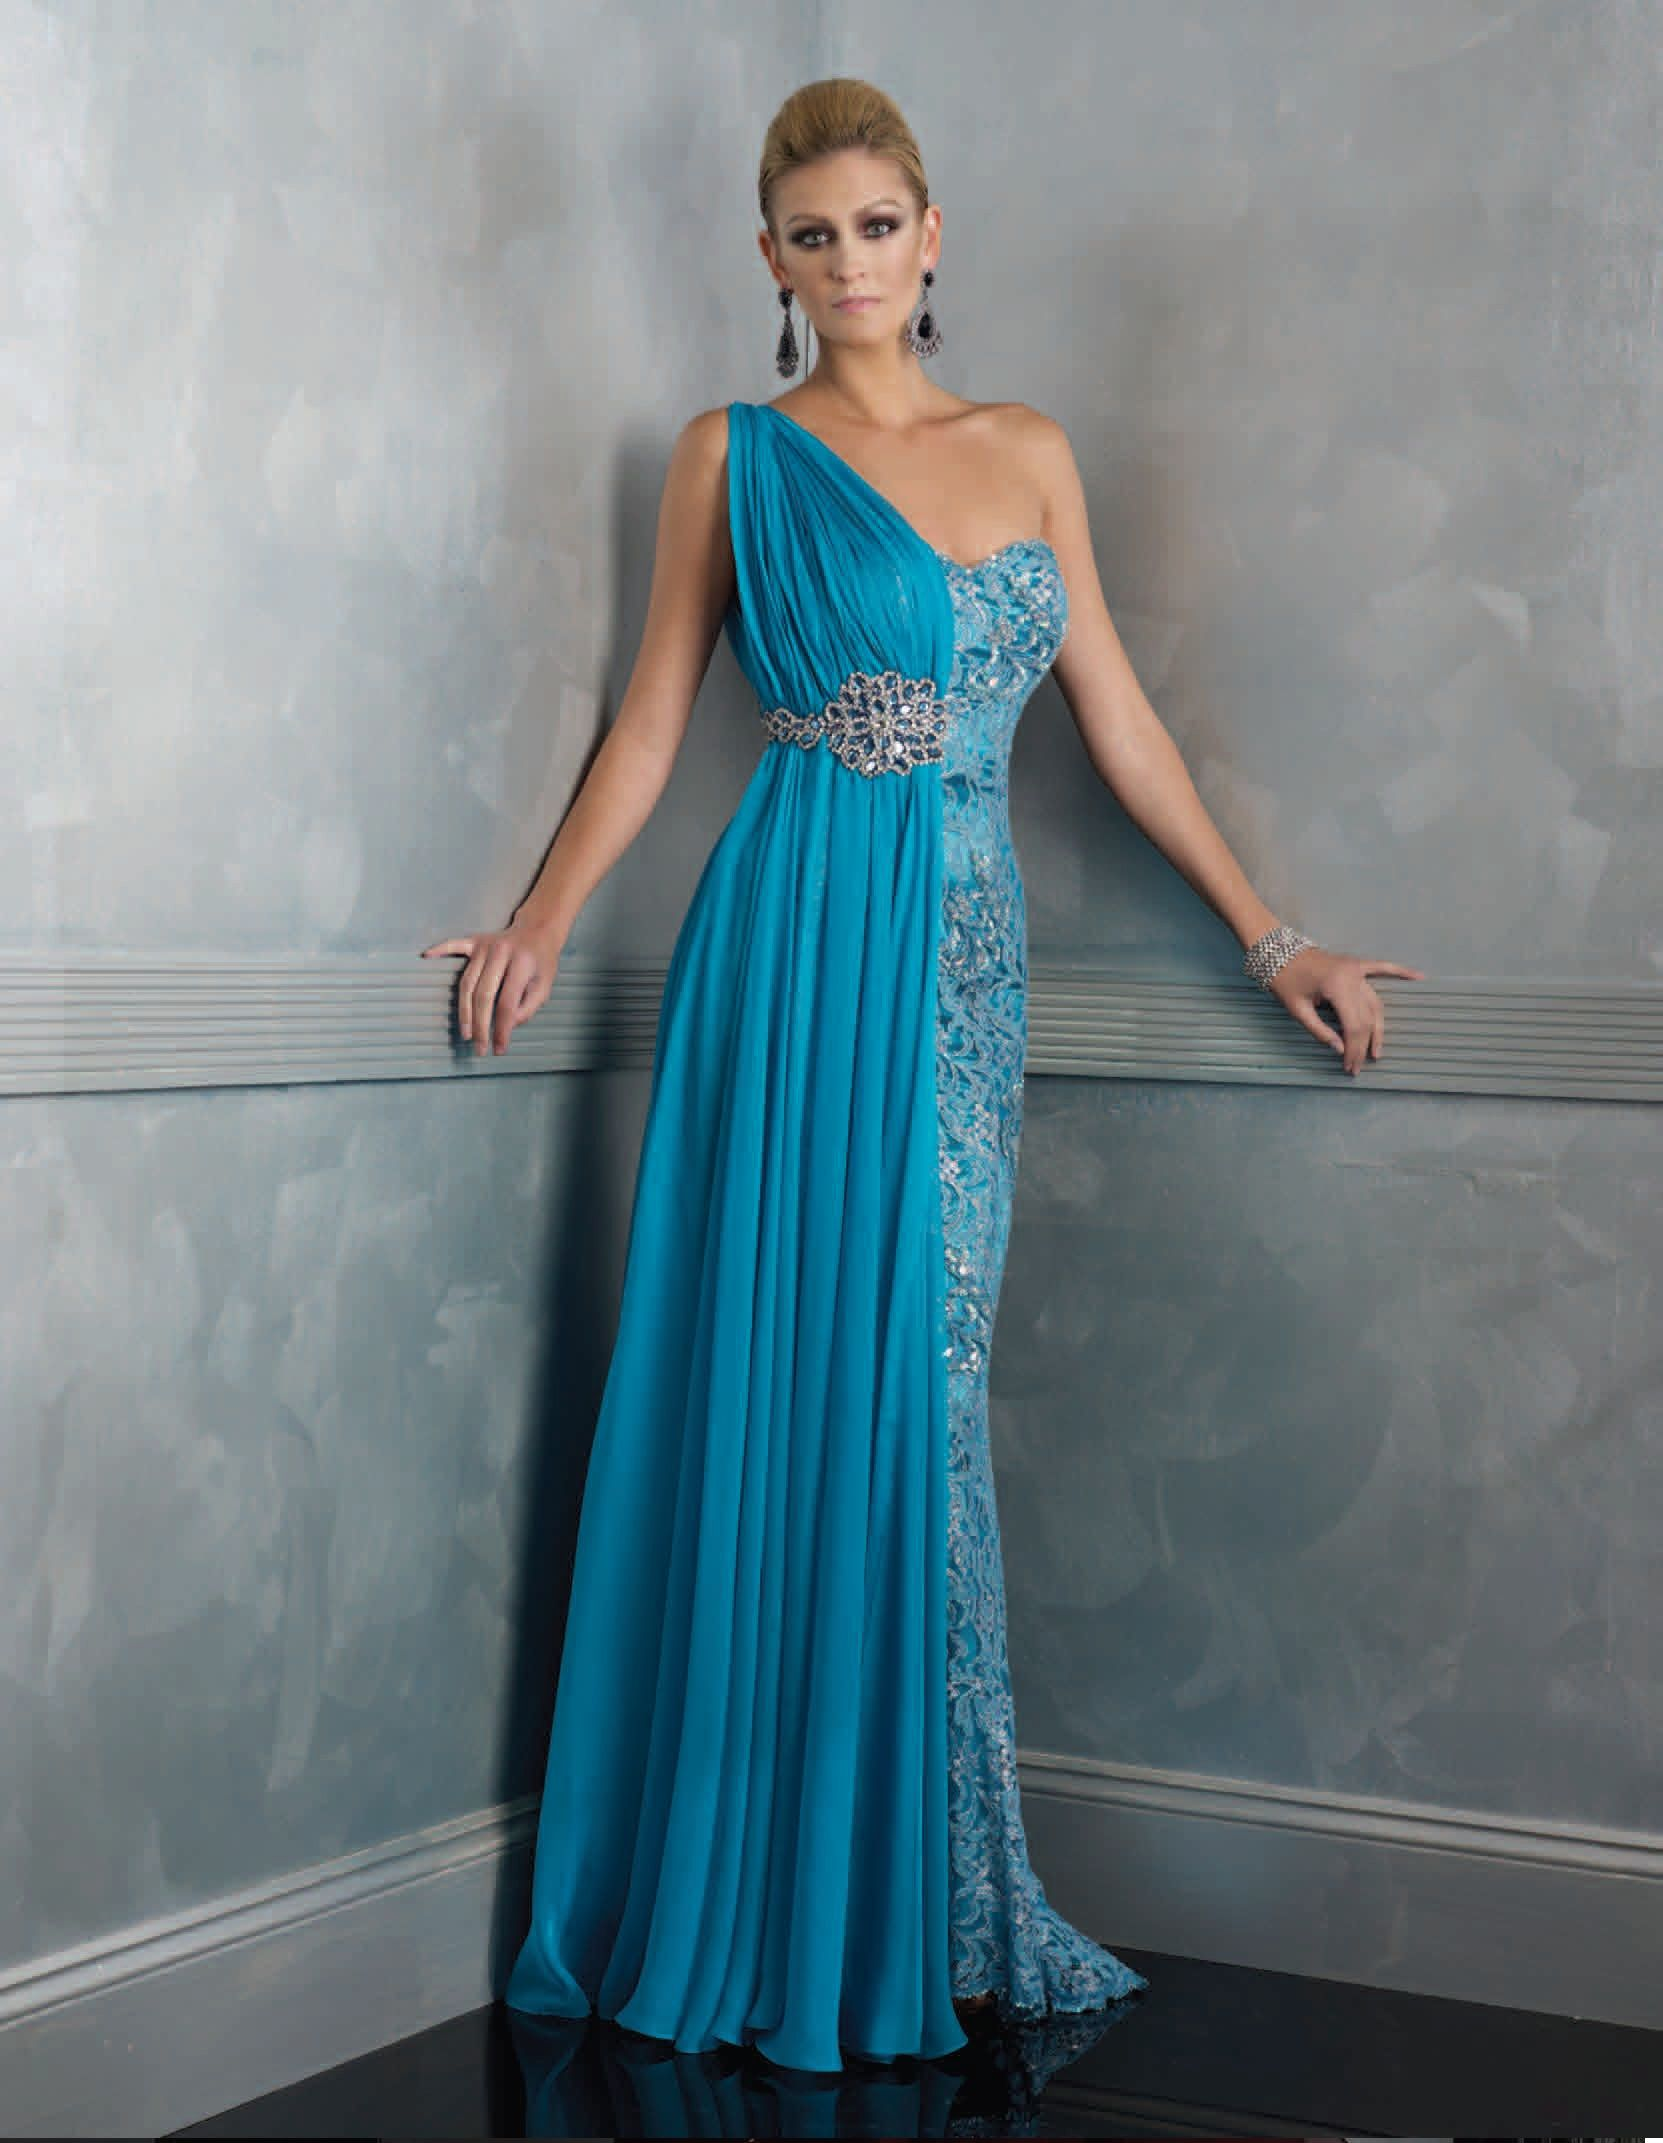 Bridesmaids (Long) : Elegant Evening Dress 11 | Bride-zilla.net ...